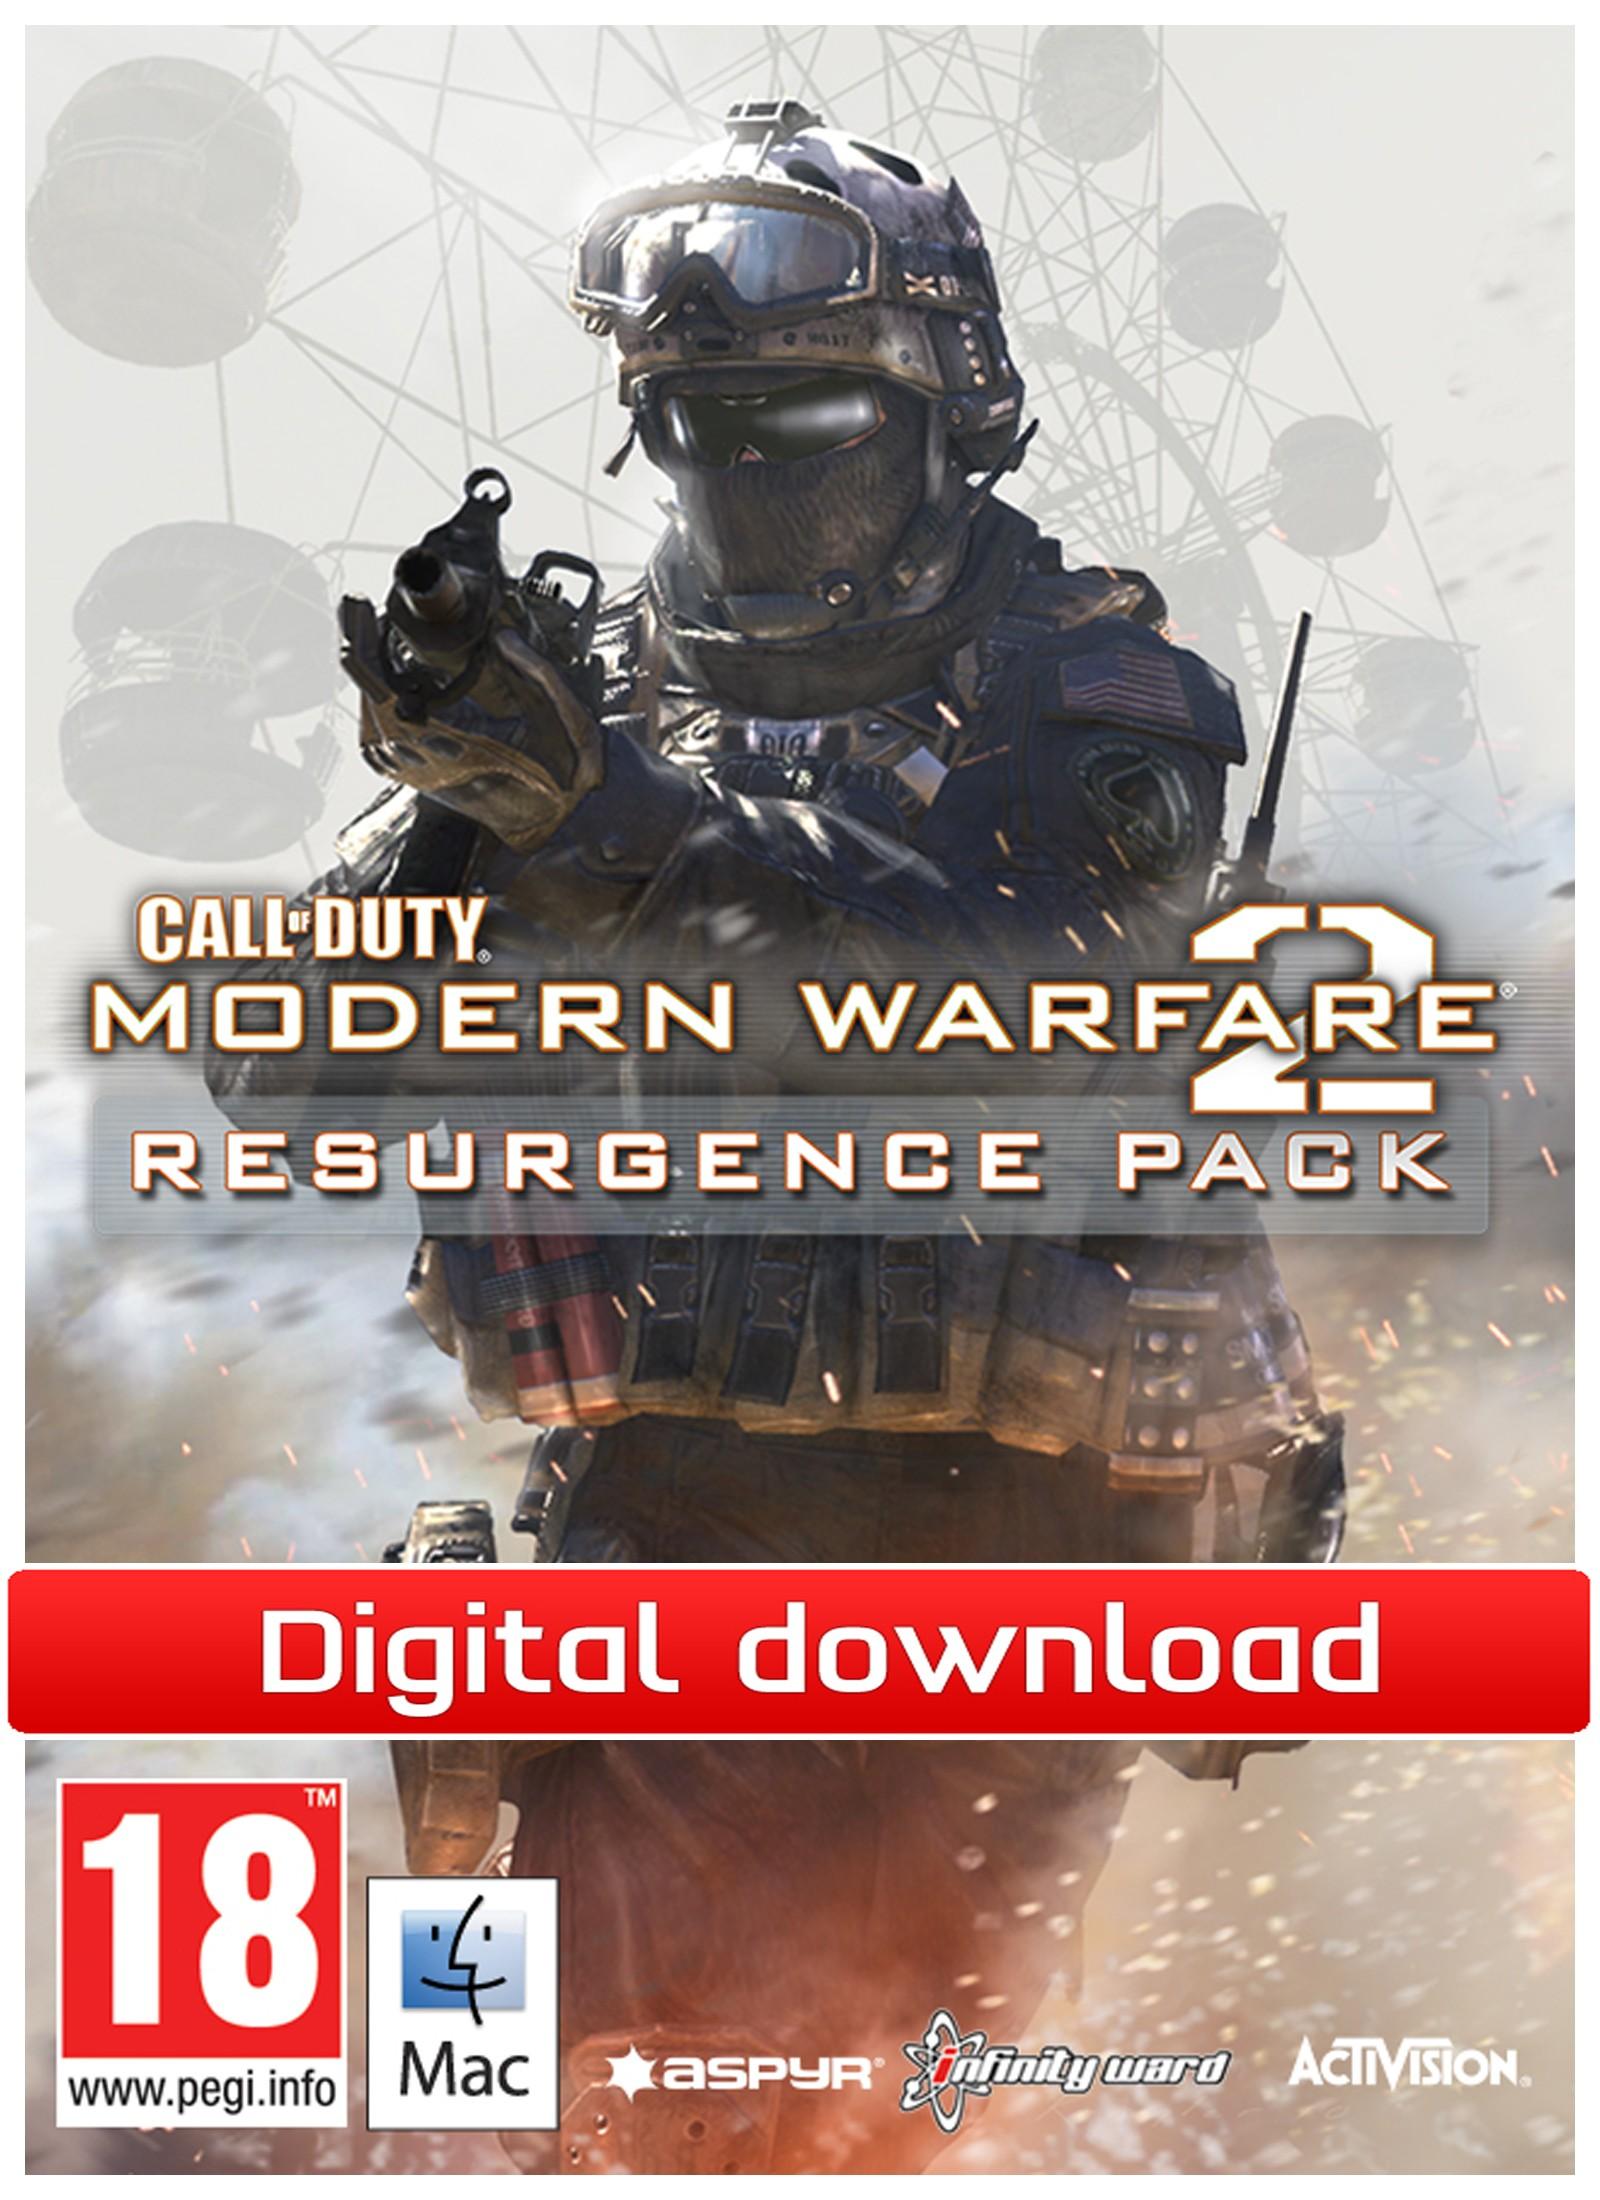 Cod Mw2 Free Download Pc